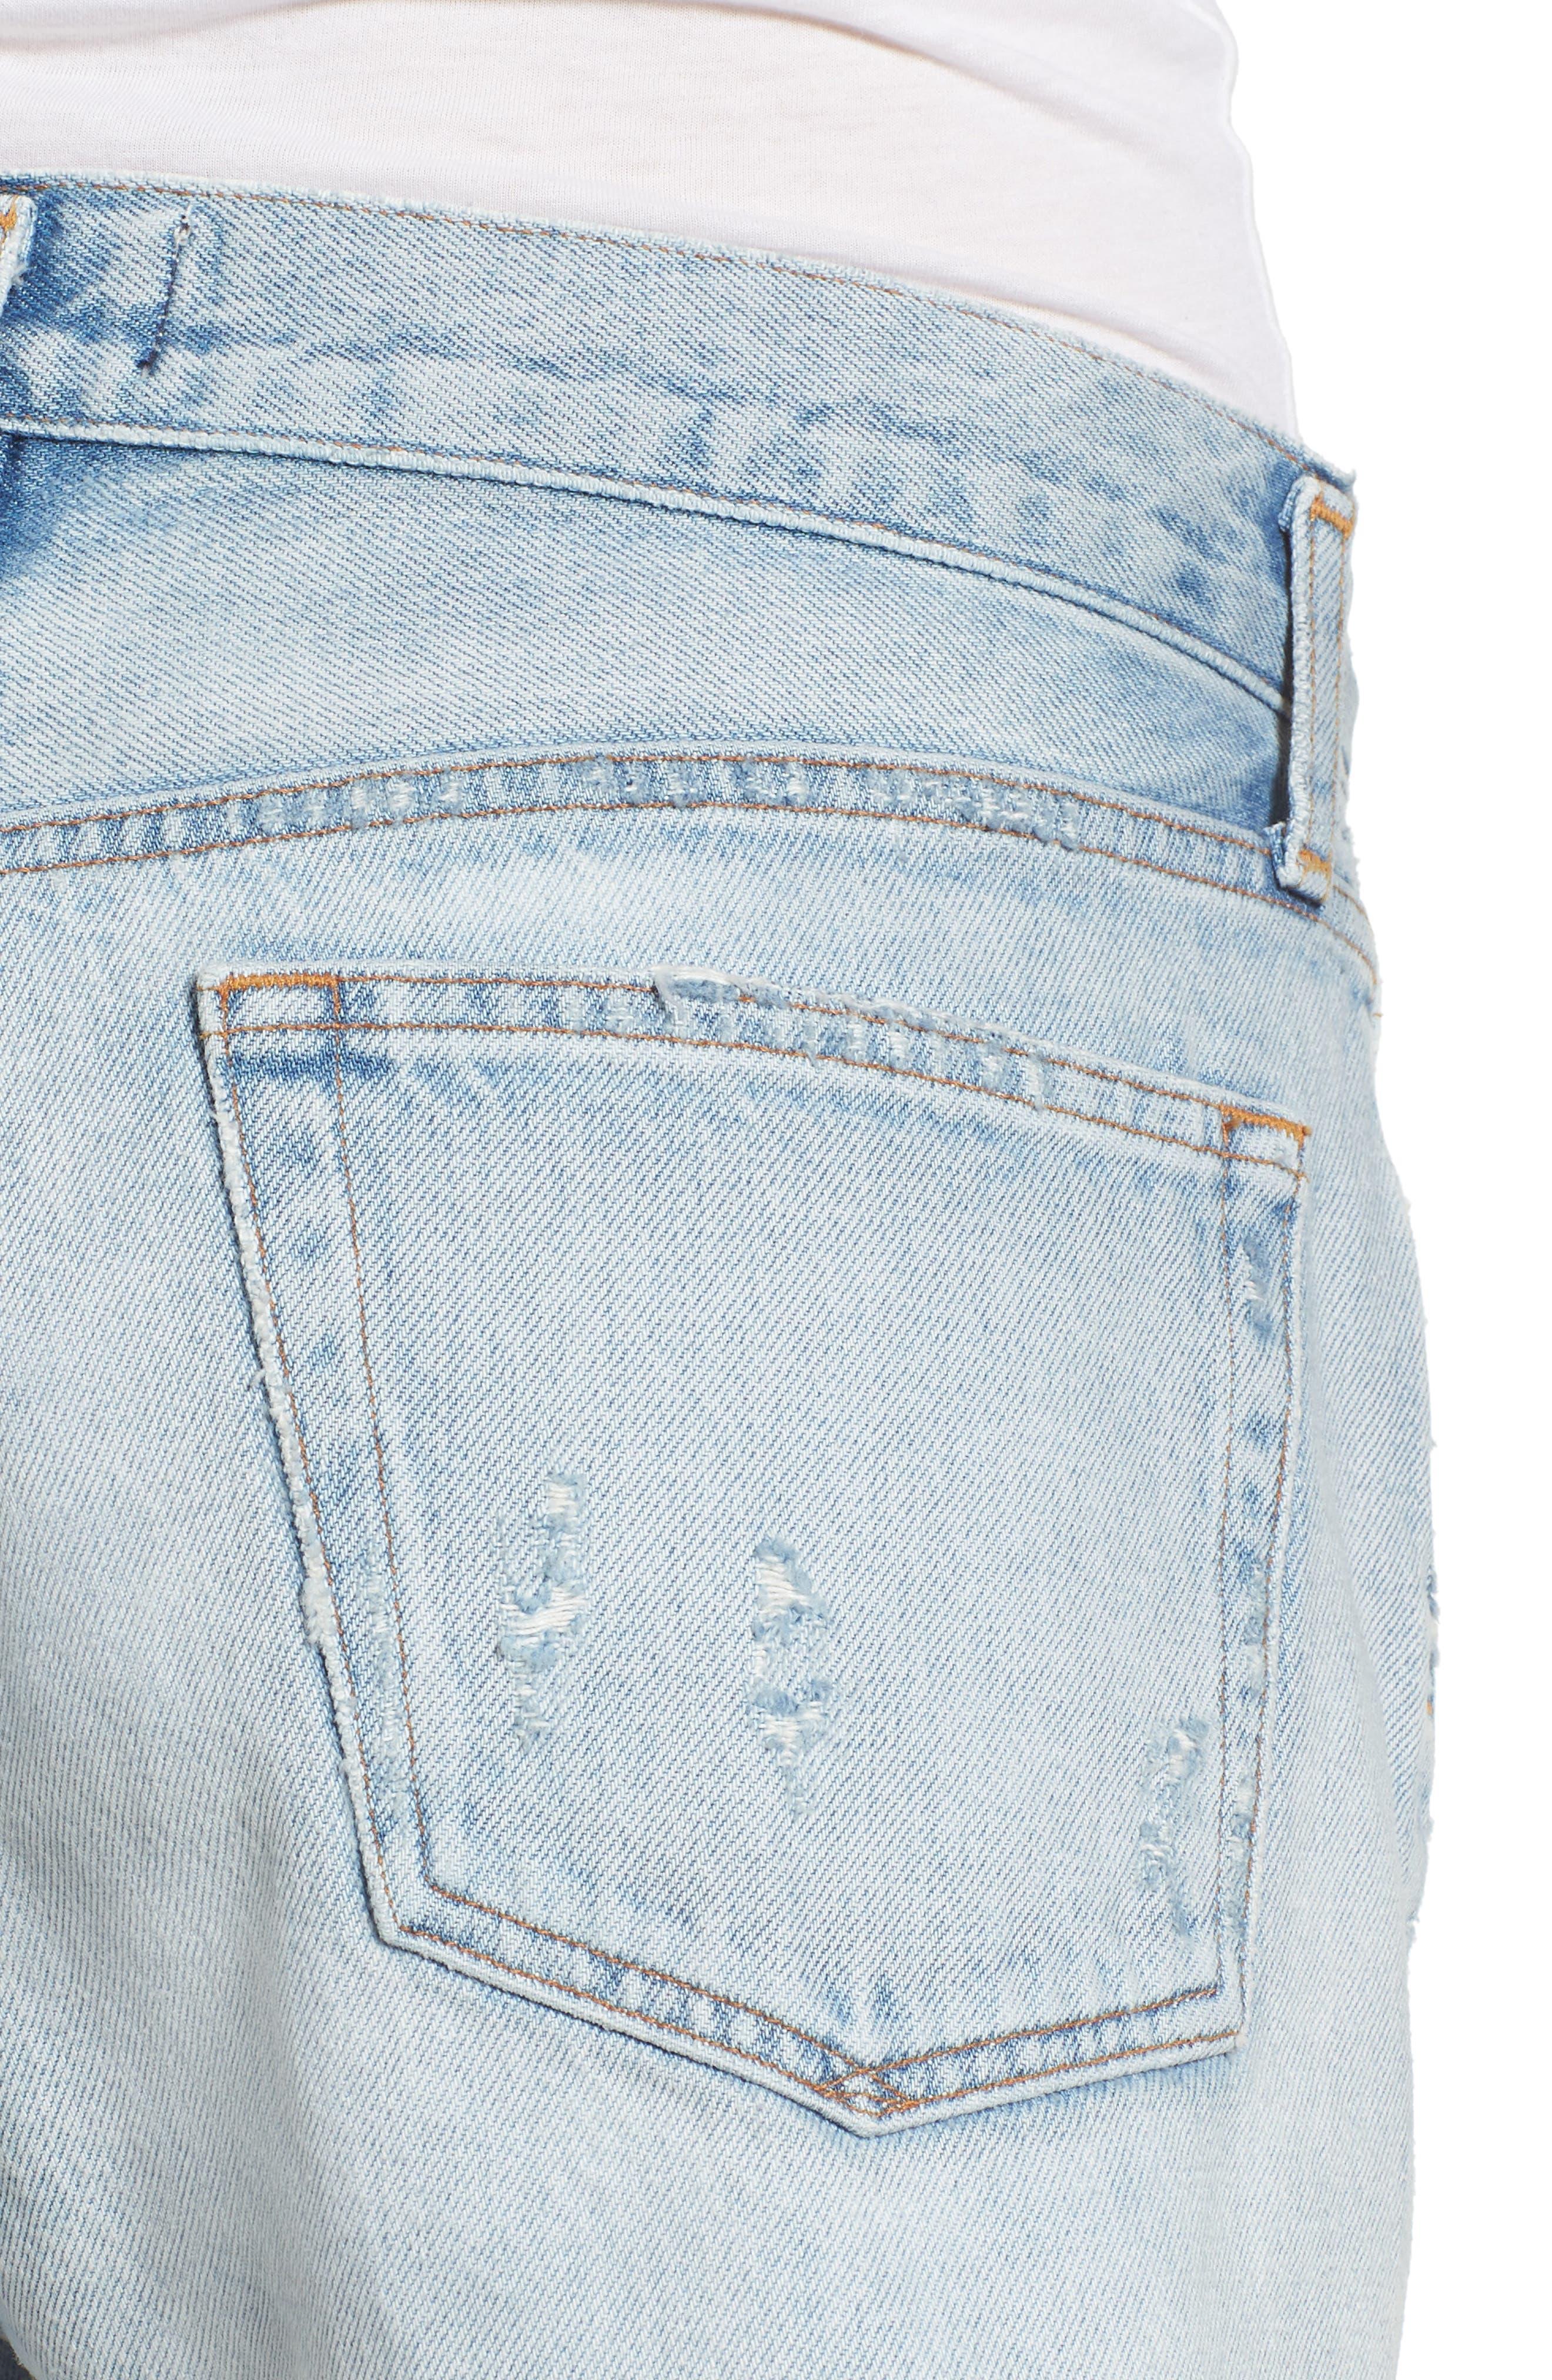 Parker Distressed Denim Shorts,                             Alternate thumbnail 4, color,                             Broken